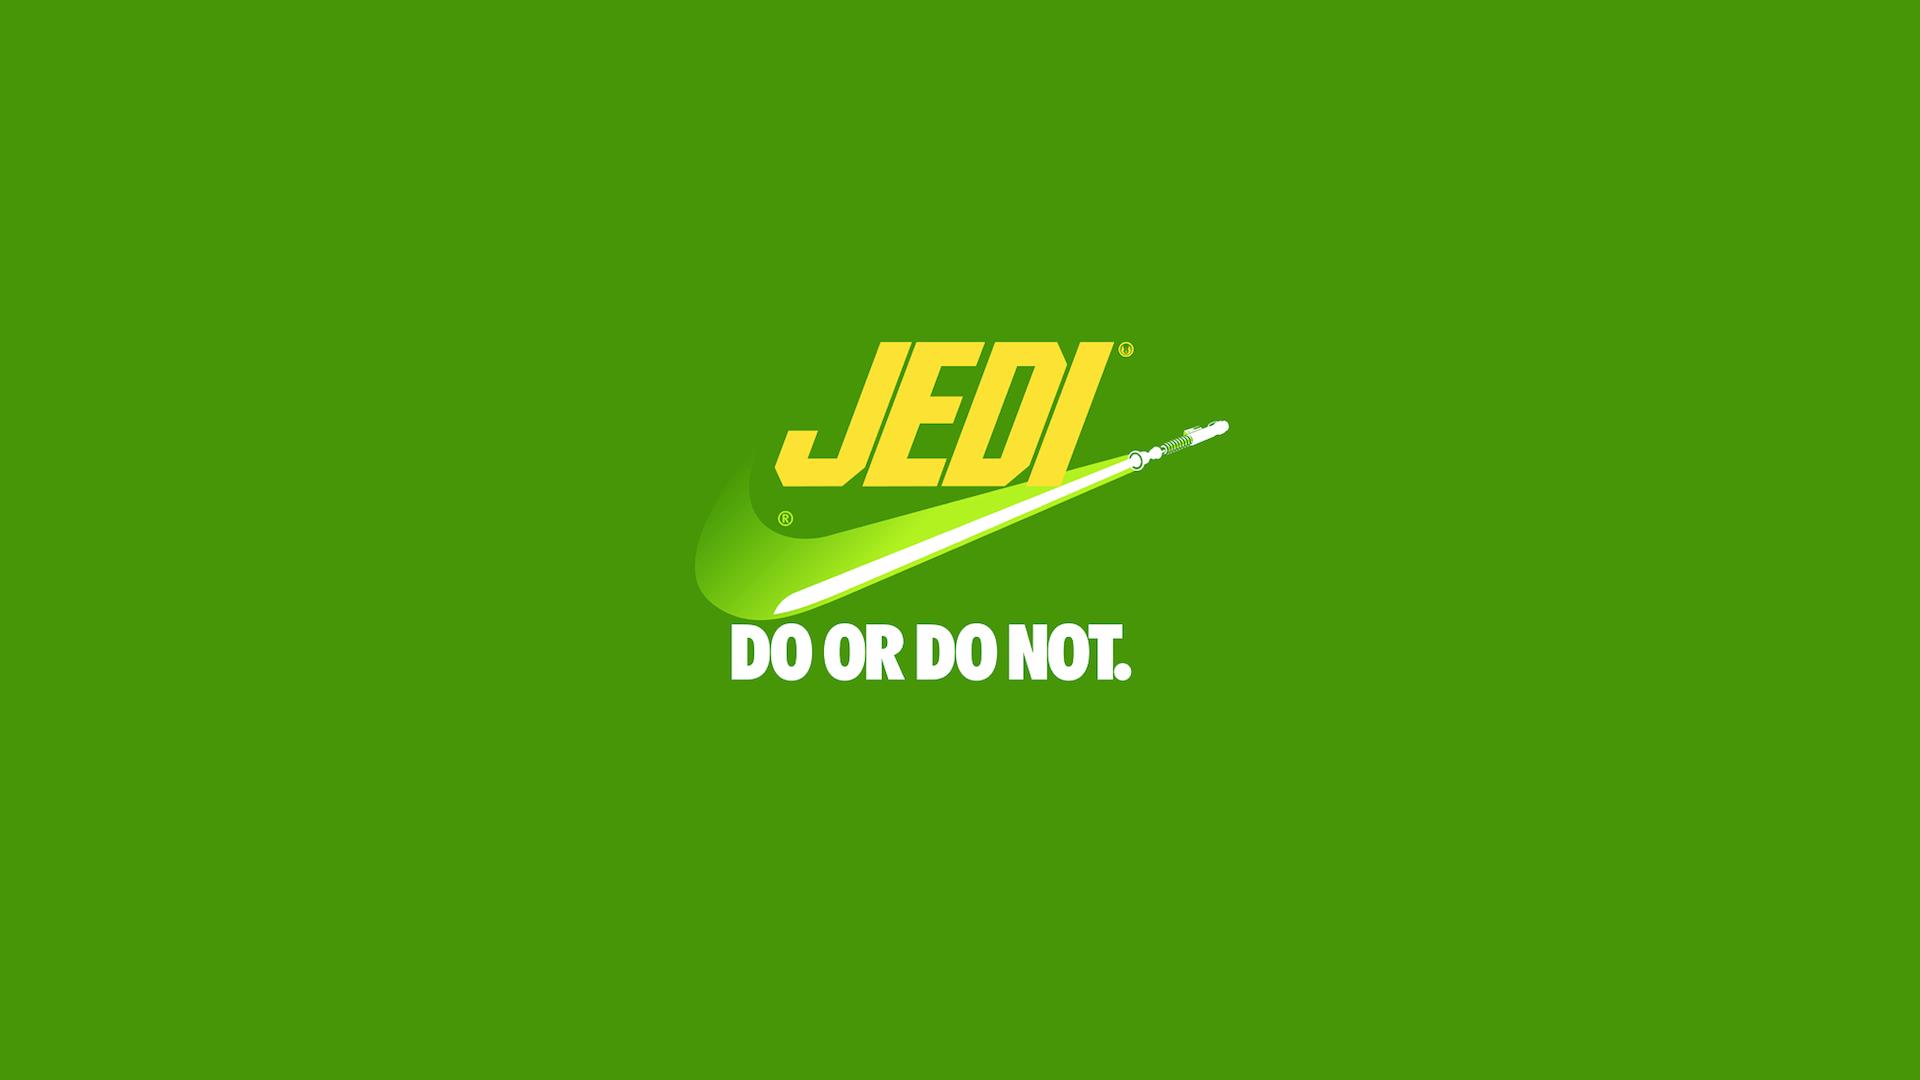 Star Wars Mandalorian Quotes Wallpaper Yoda Backgrounds Wallpaper Cave